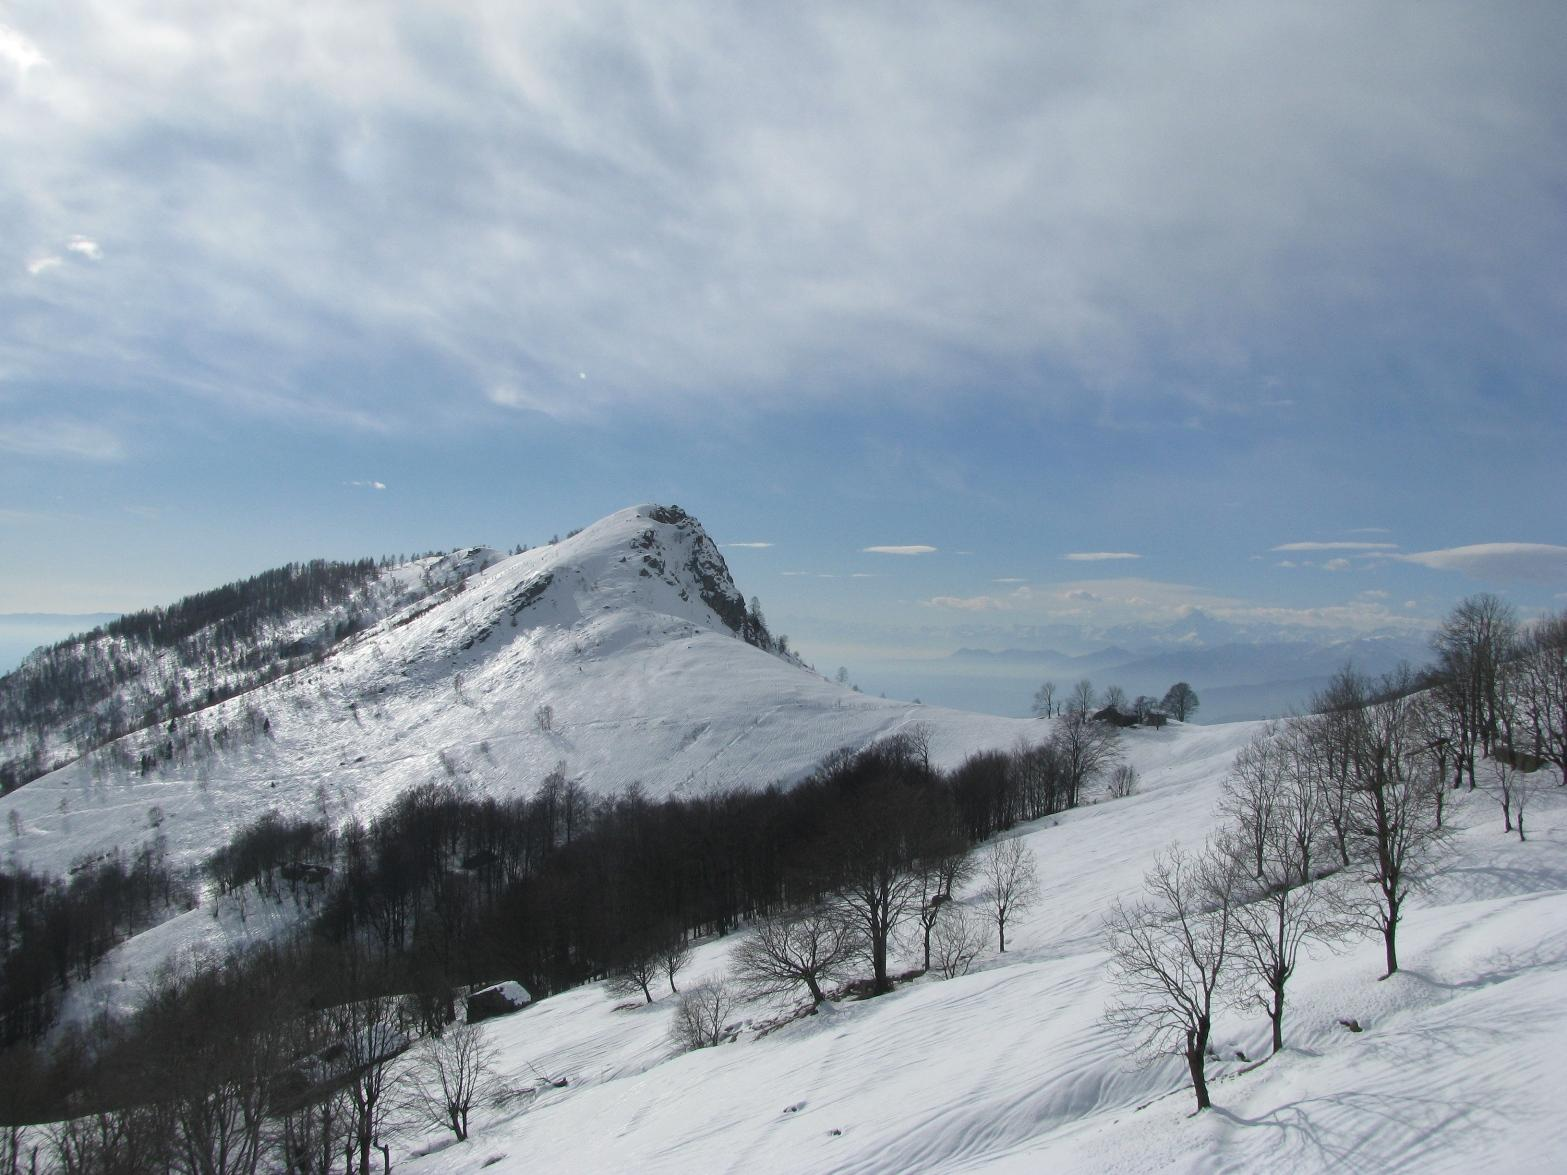 Uno sguardo al vicino Monte Calvo